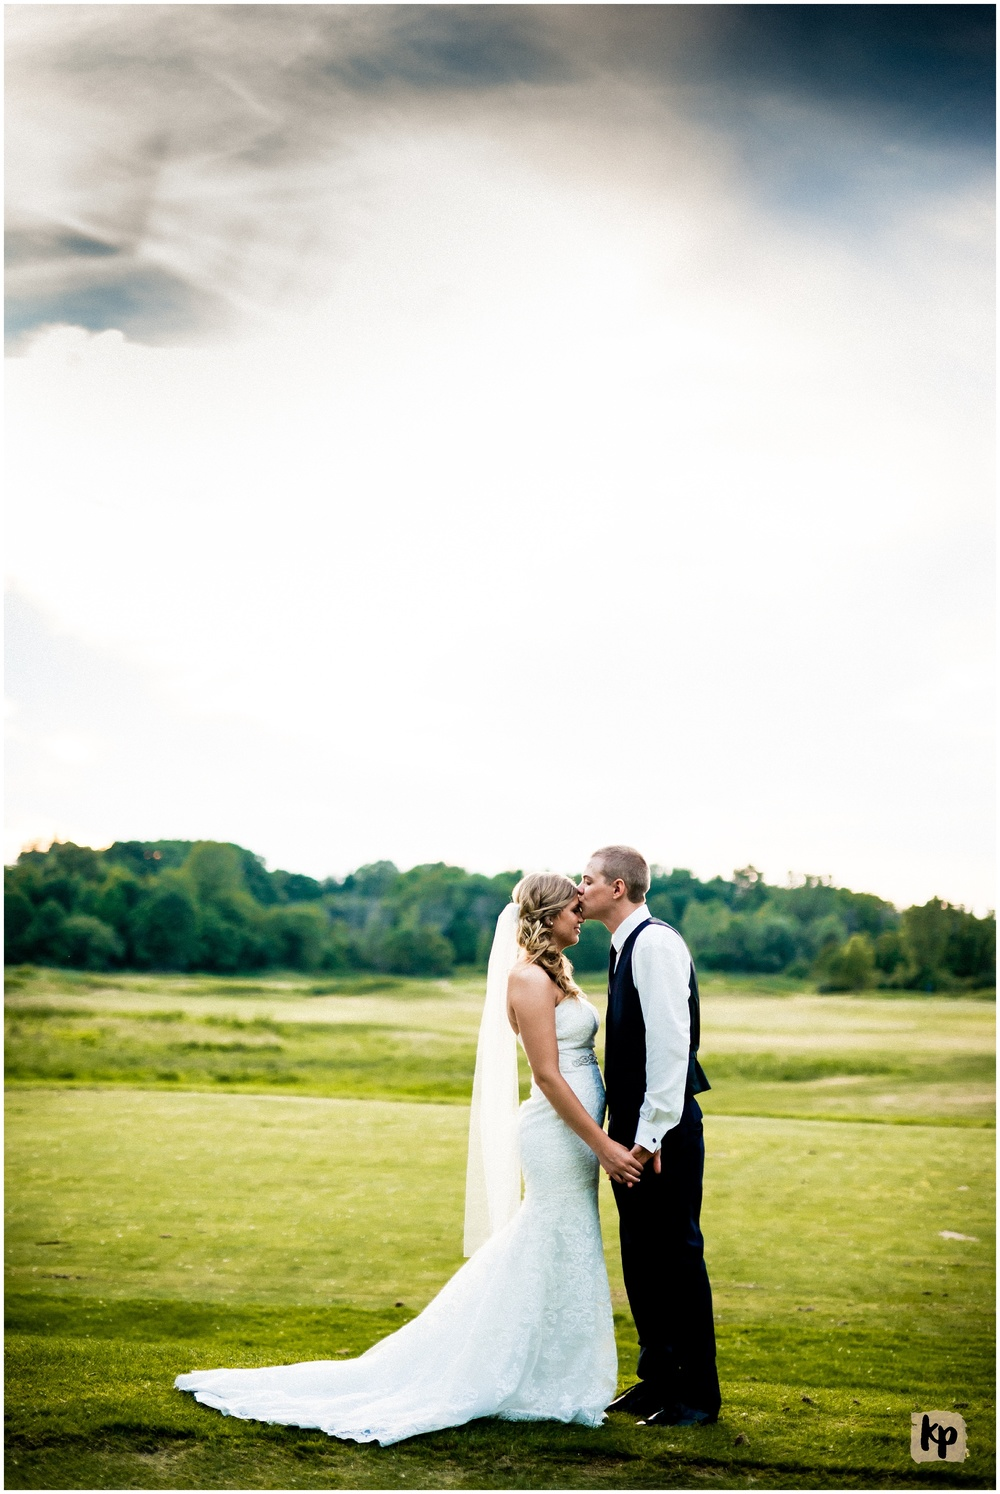 Matthieu + Katlyn | Just Married #kyleepaigephotography_0123.jpg